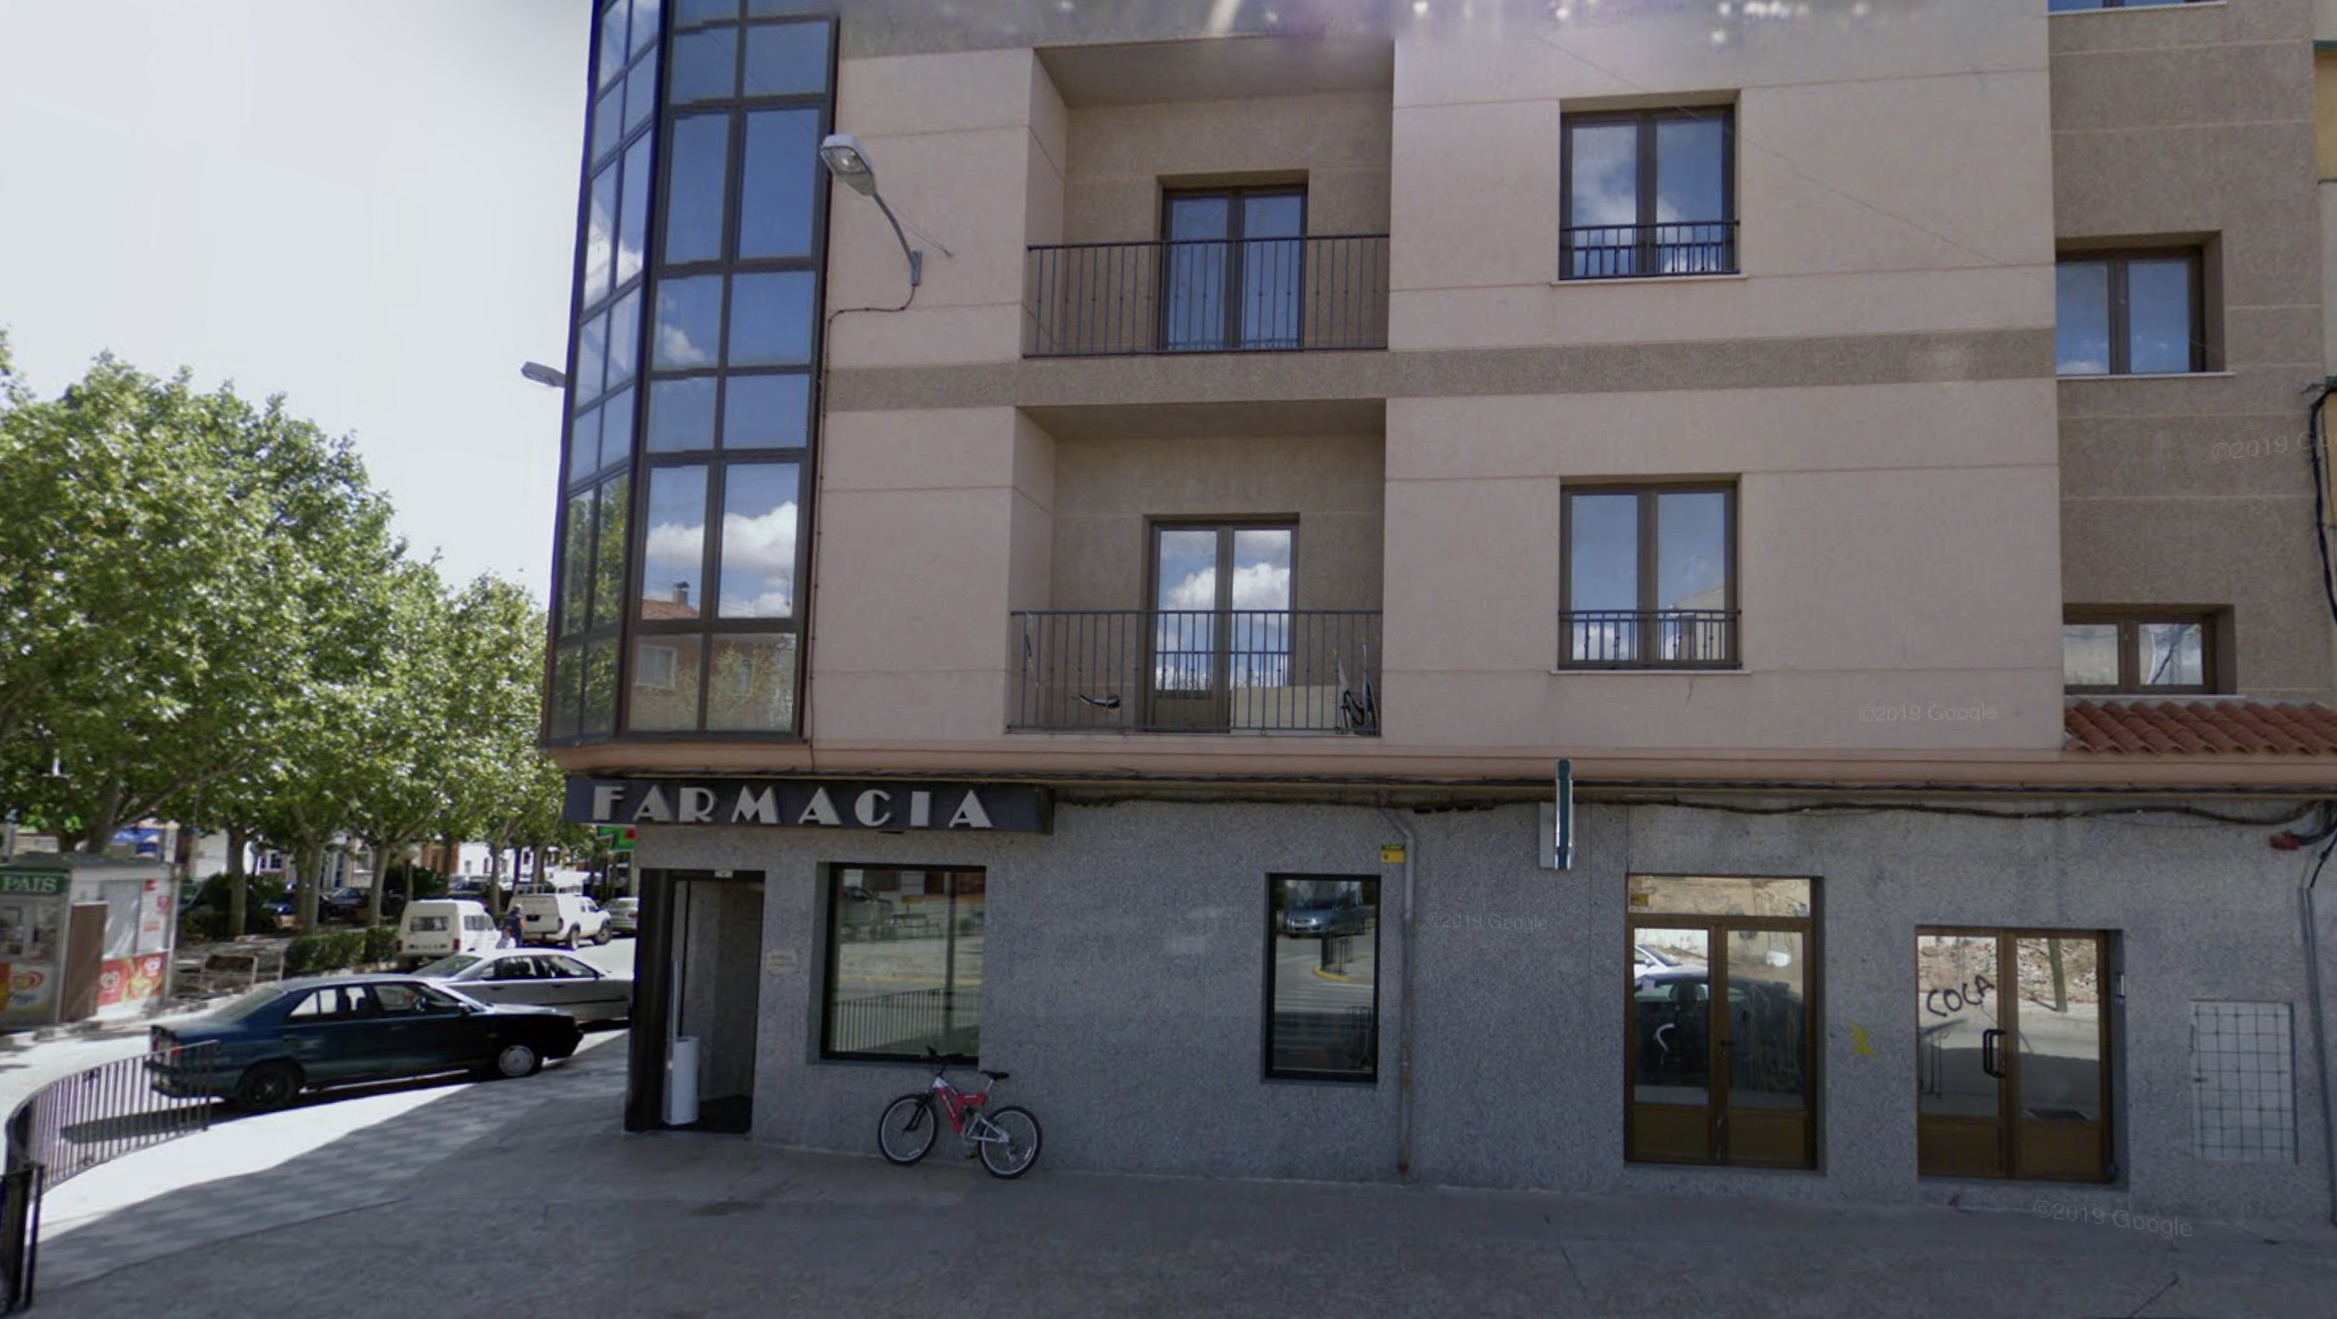 Farmacia vendida en Motilla del Palancar – Cuenca